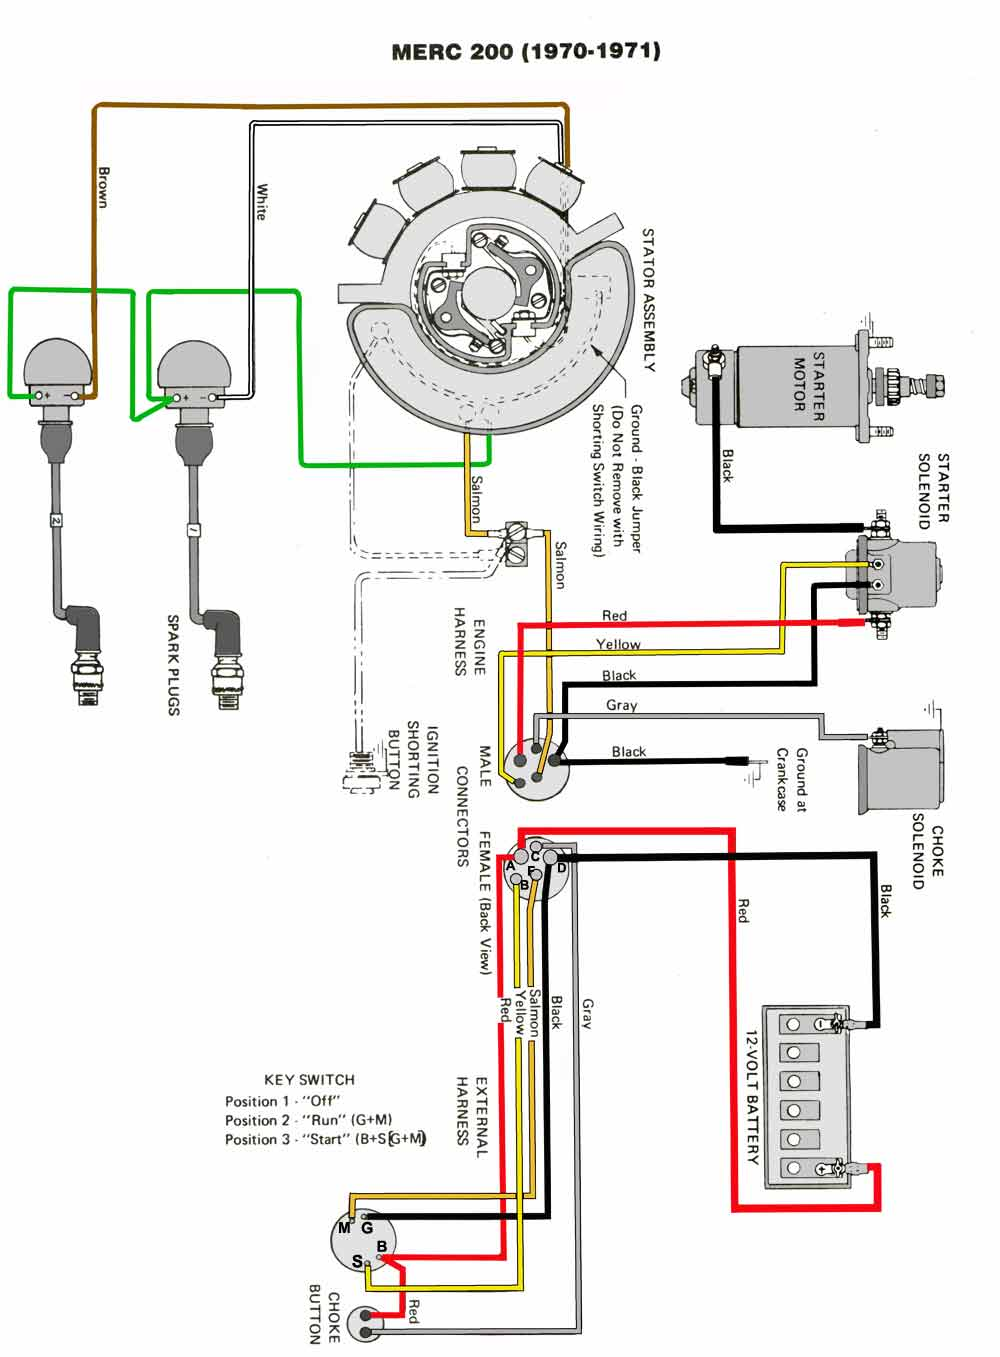 75 hp mercury outboard wiring diagram wiring diagrams favorites 2008 75 hp mercury optimax wiring diagram [ 1000 x 1357 Pixel ]